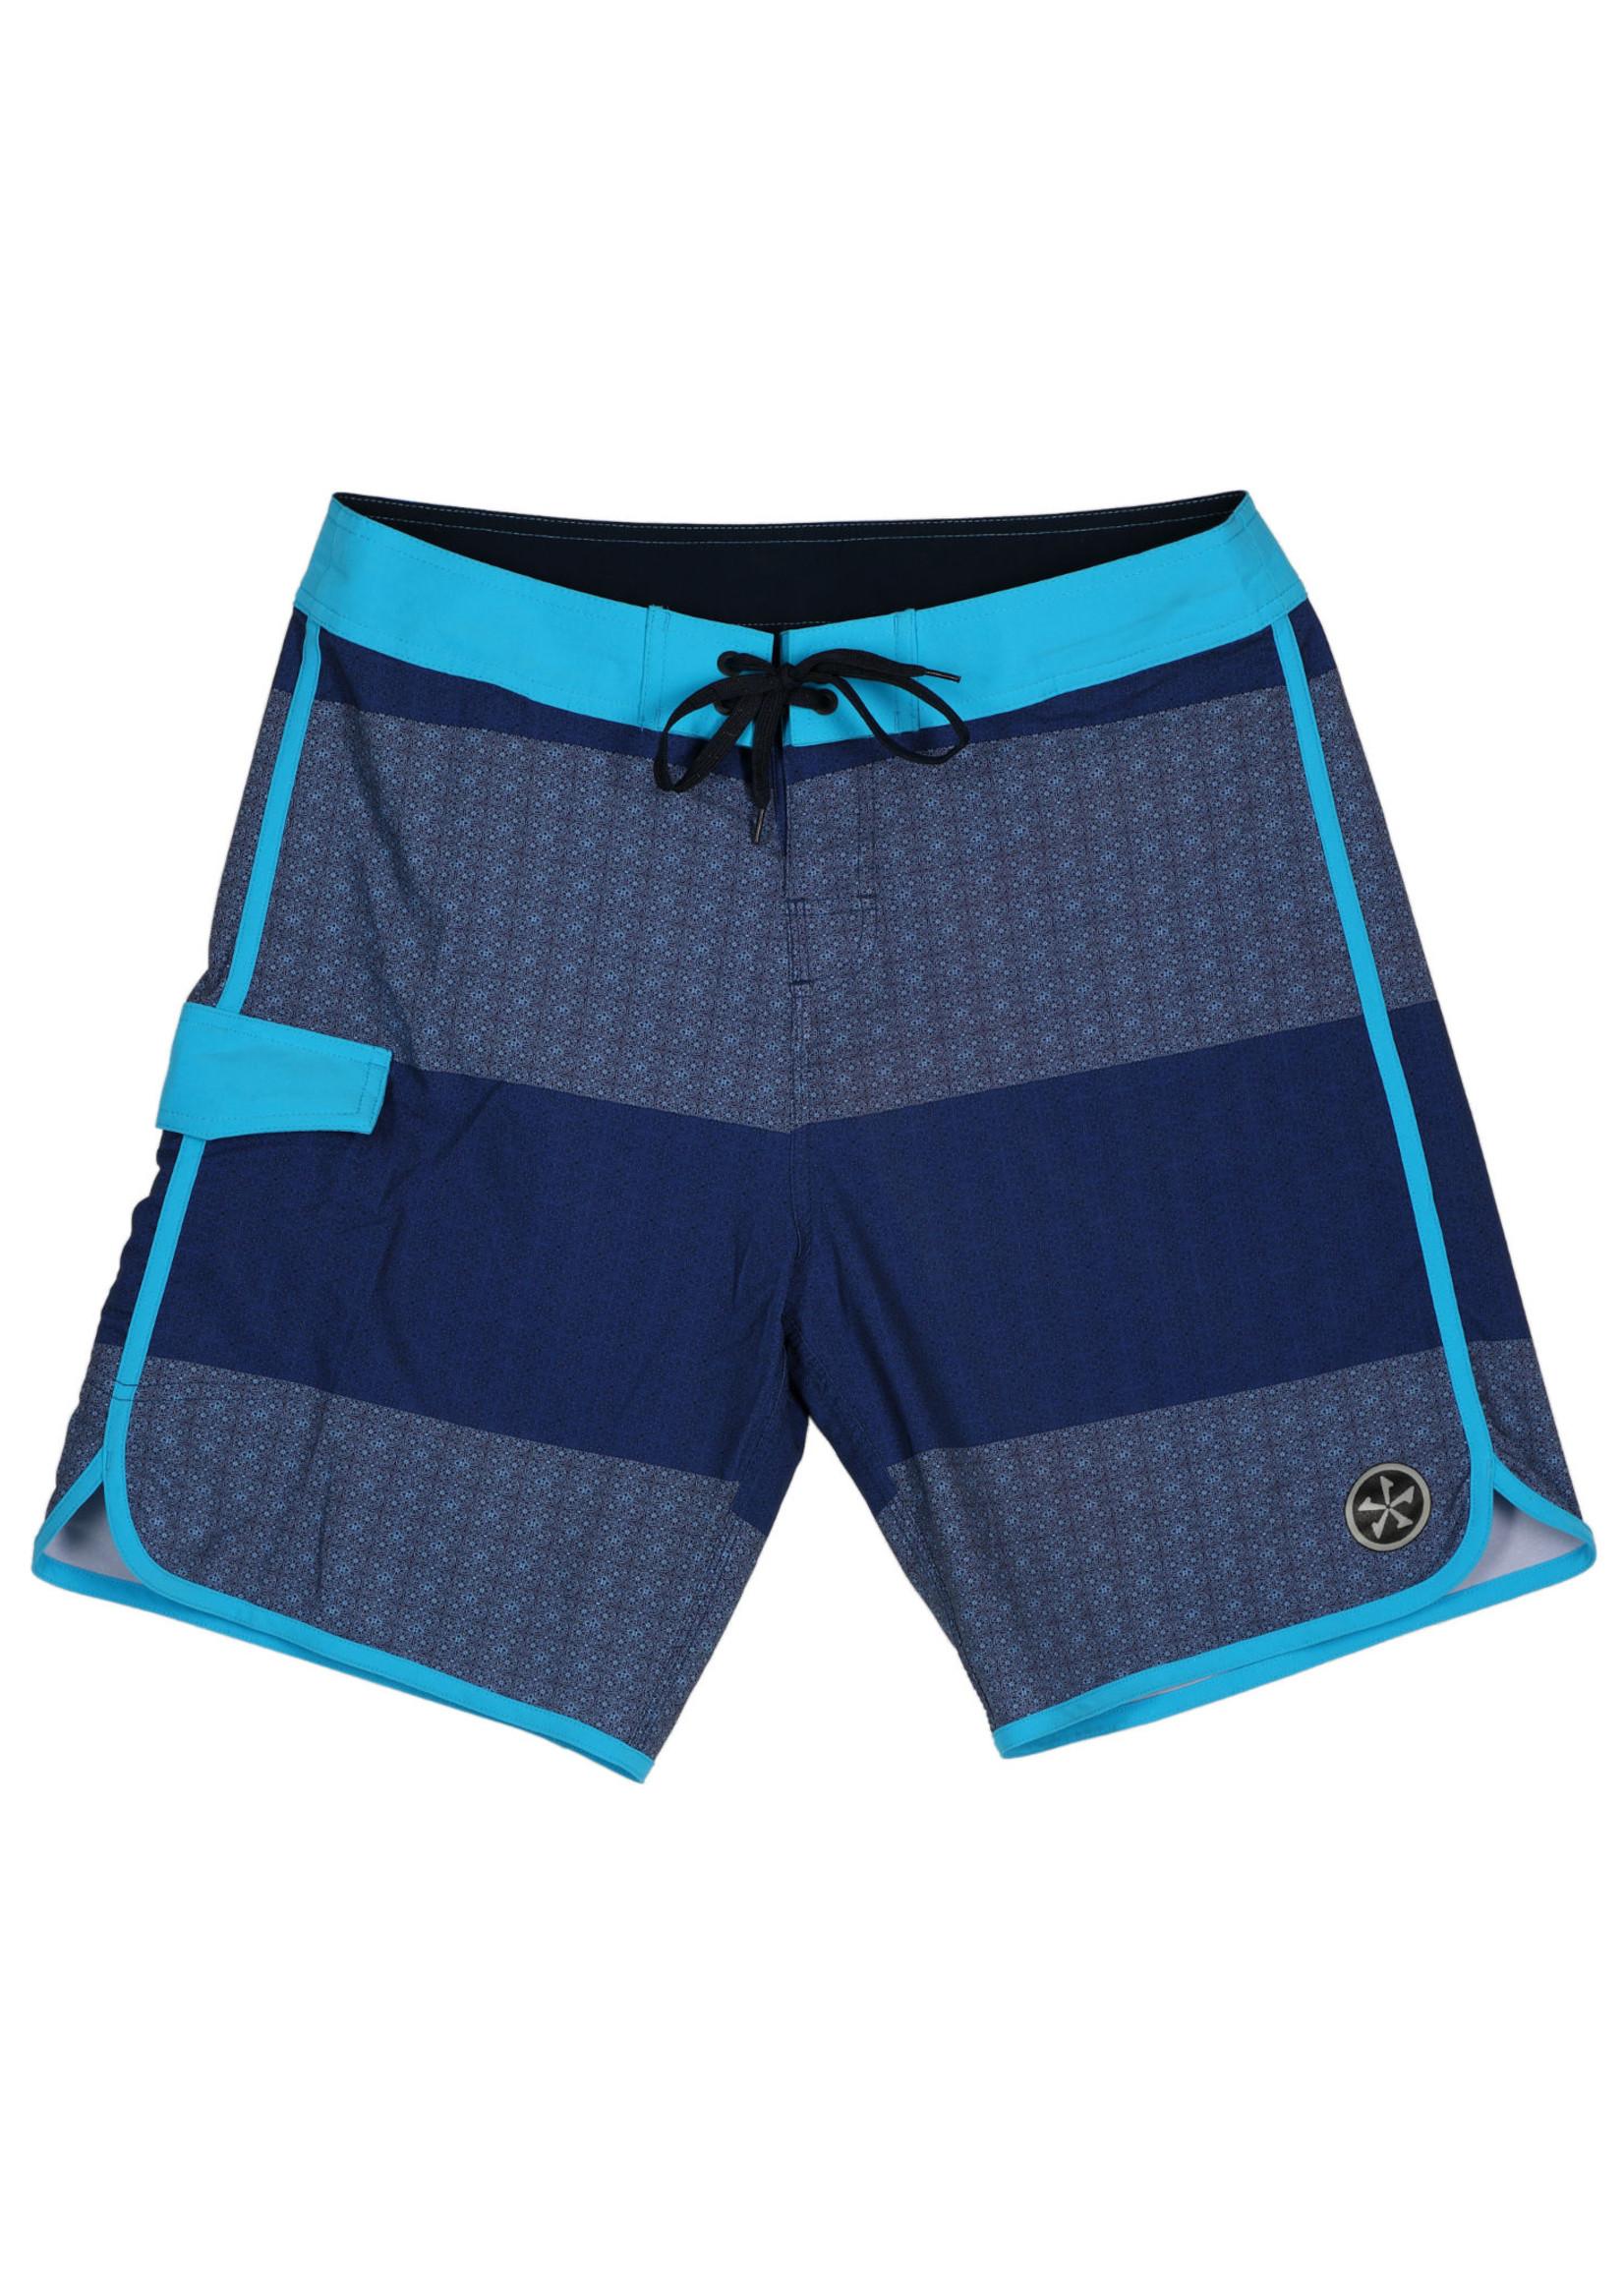 Phase Five Phase Five Mens Boardshorts Black/Blue